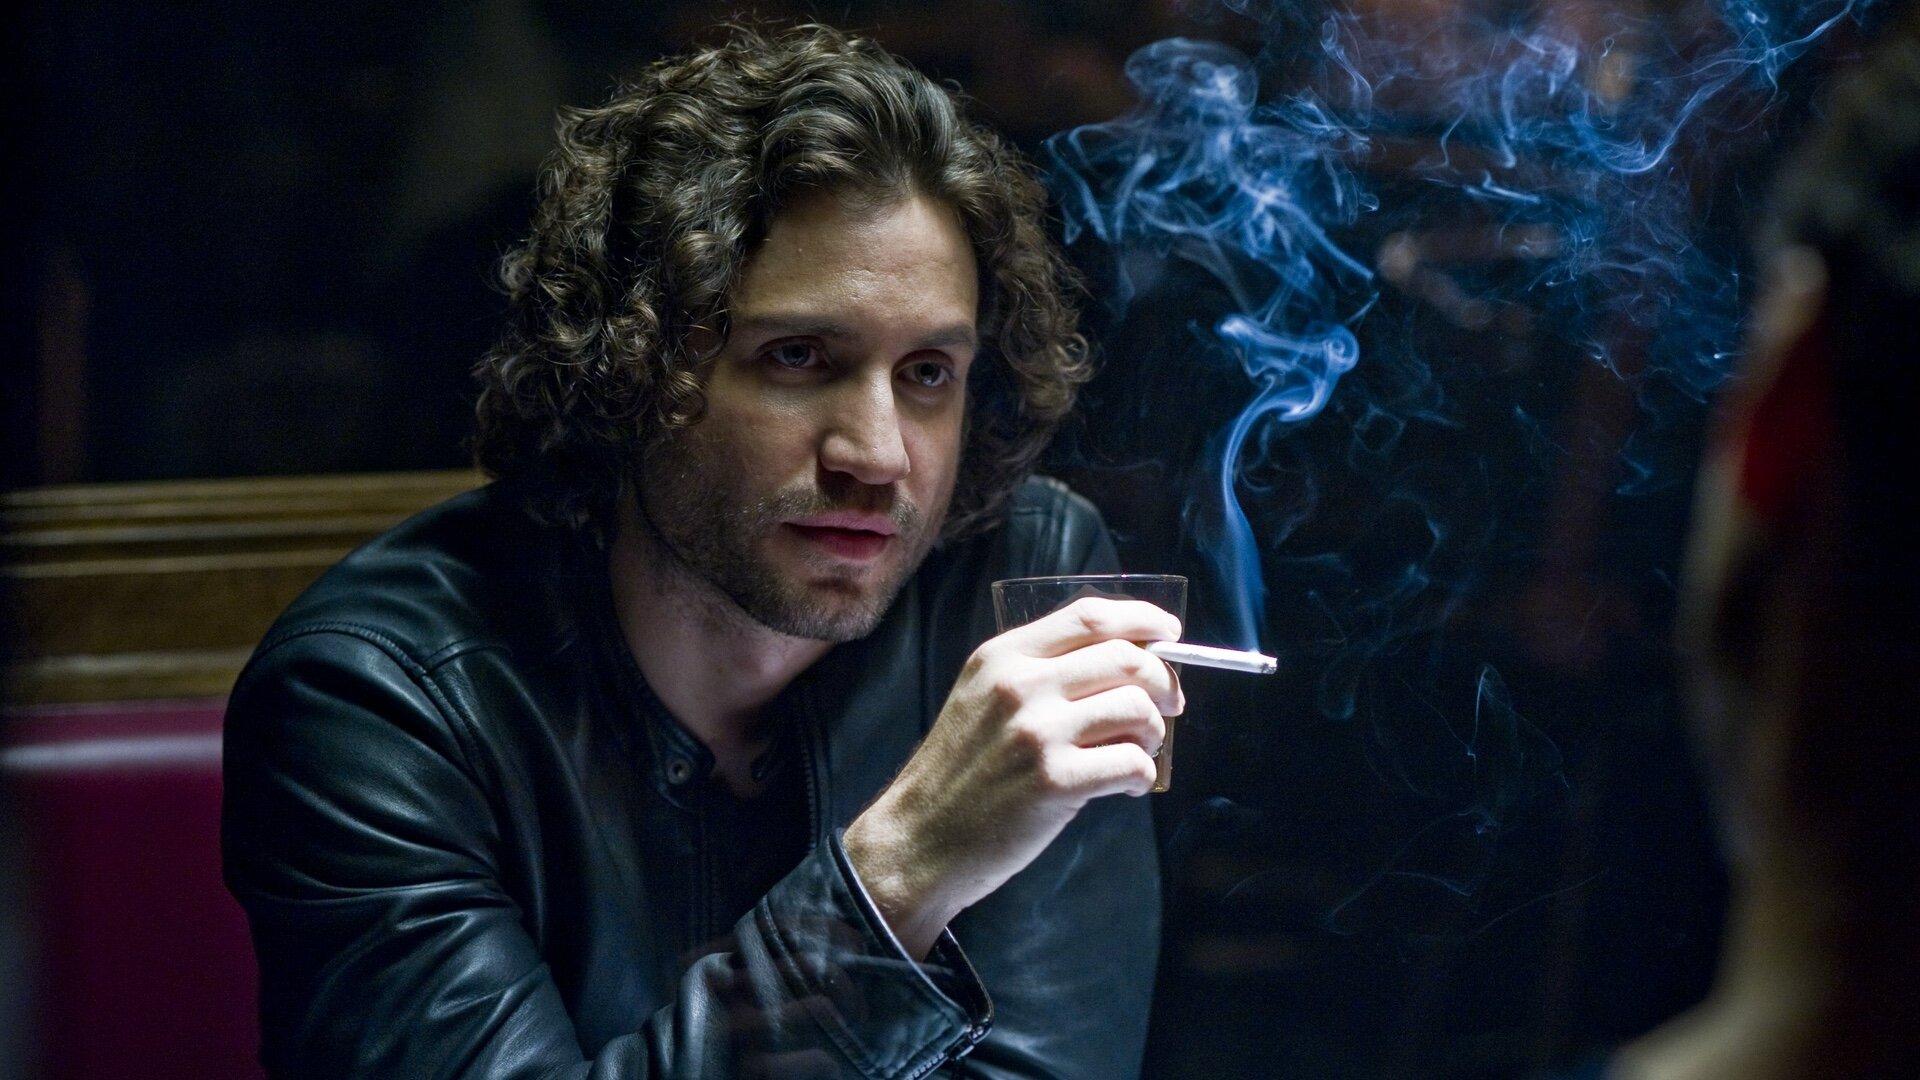 Netflix's New Series 'Florida Man' Release Date | Starring Brilliant Actor Édgar Ramírez